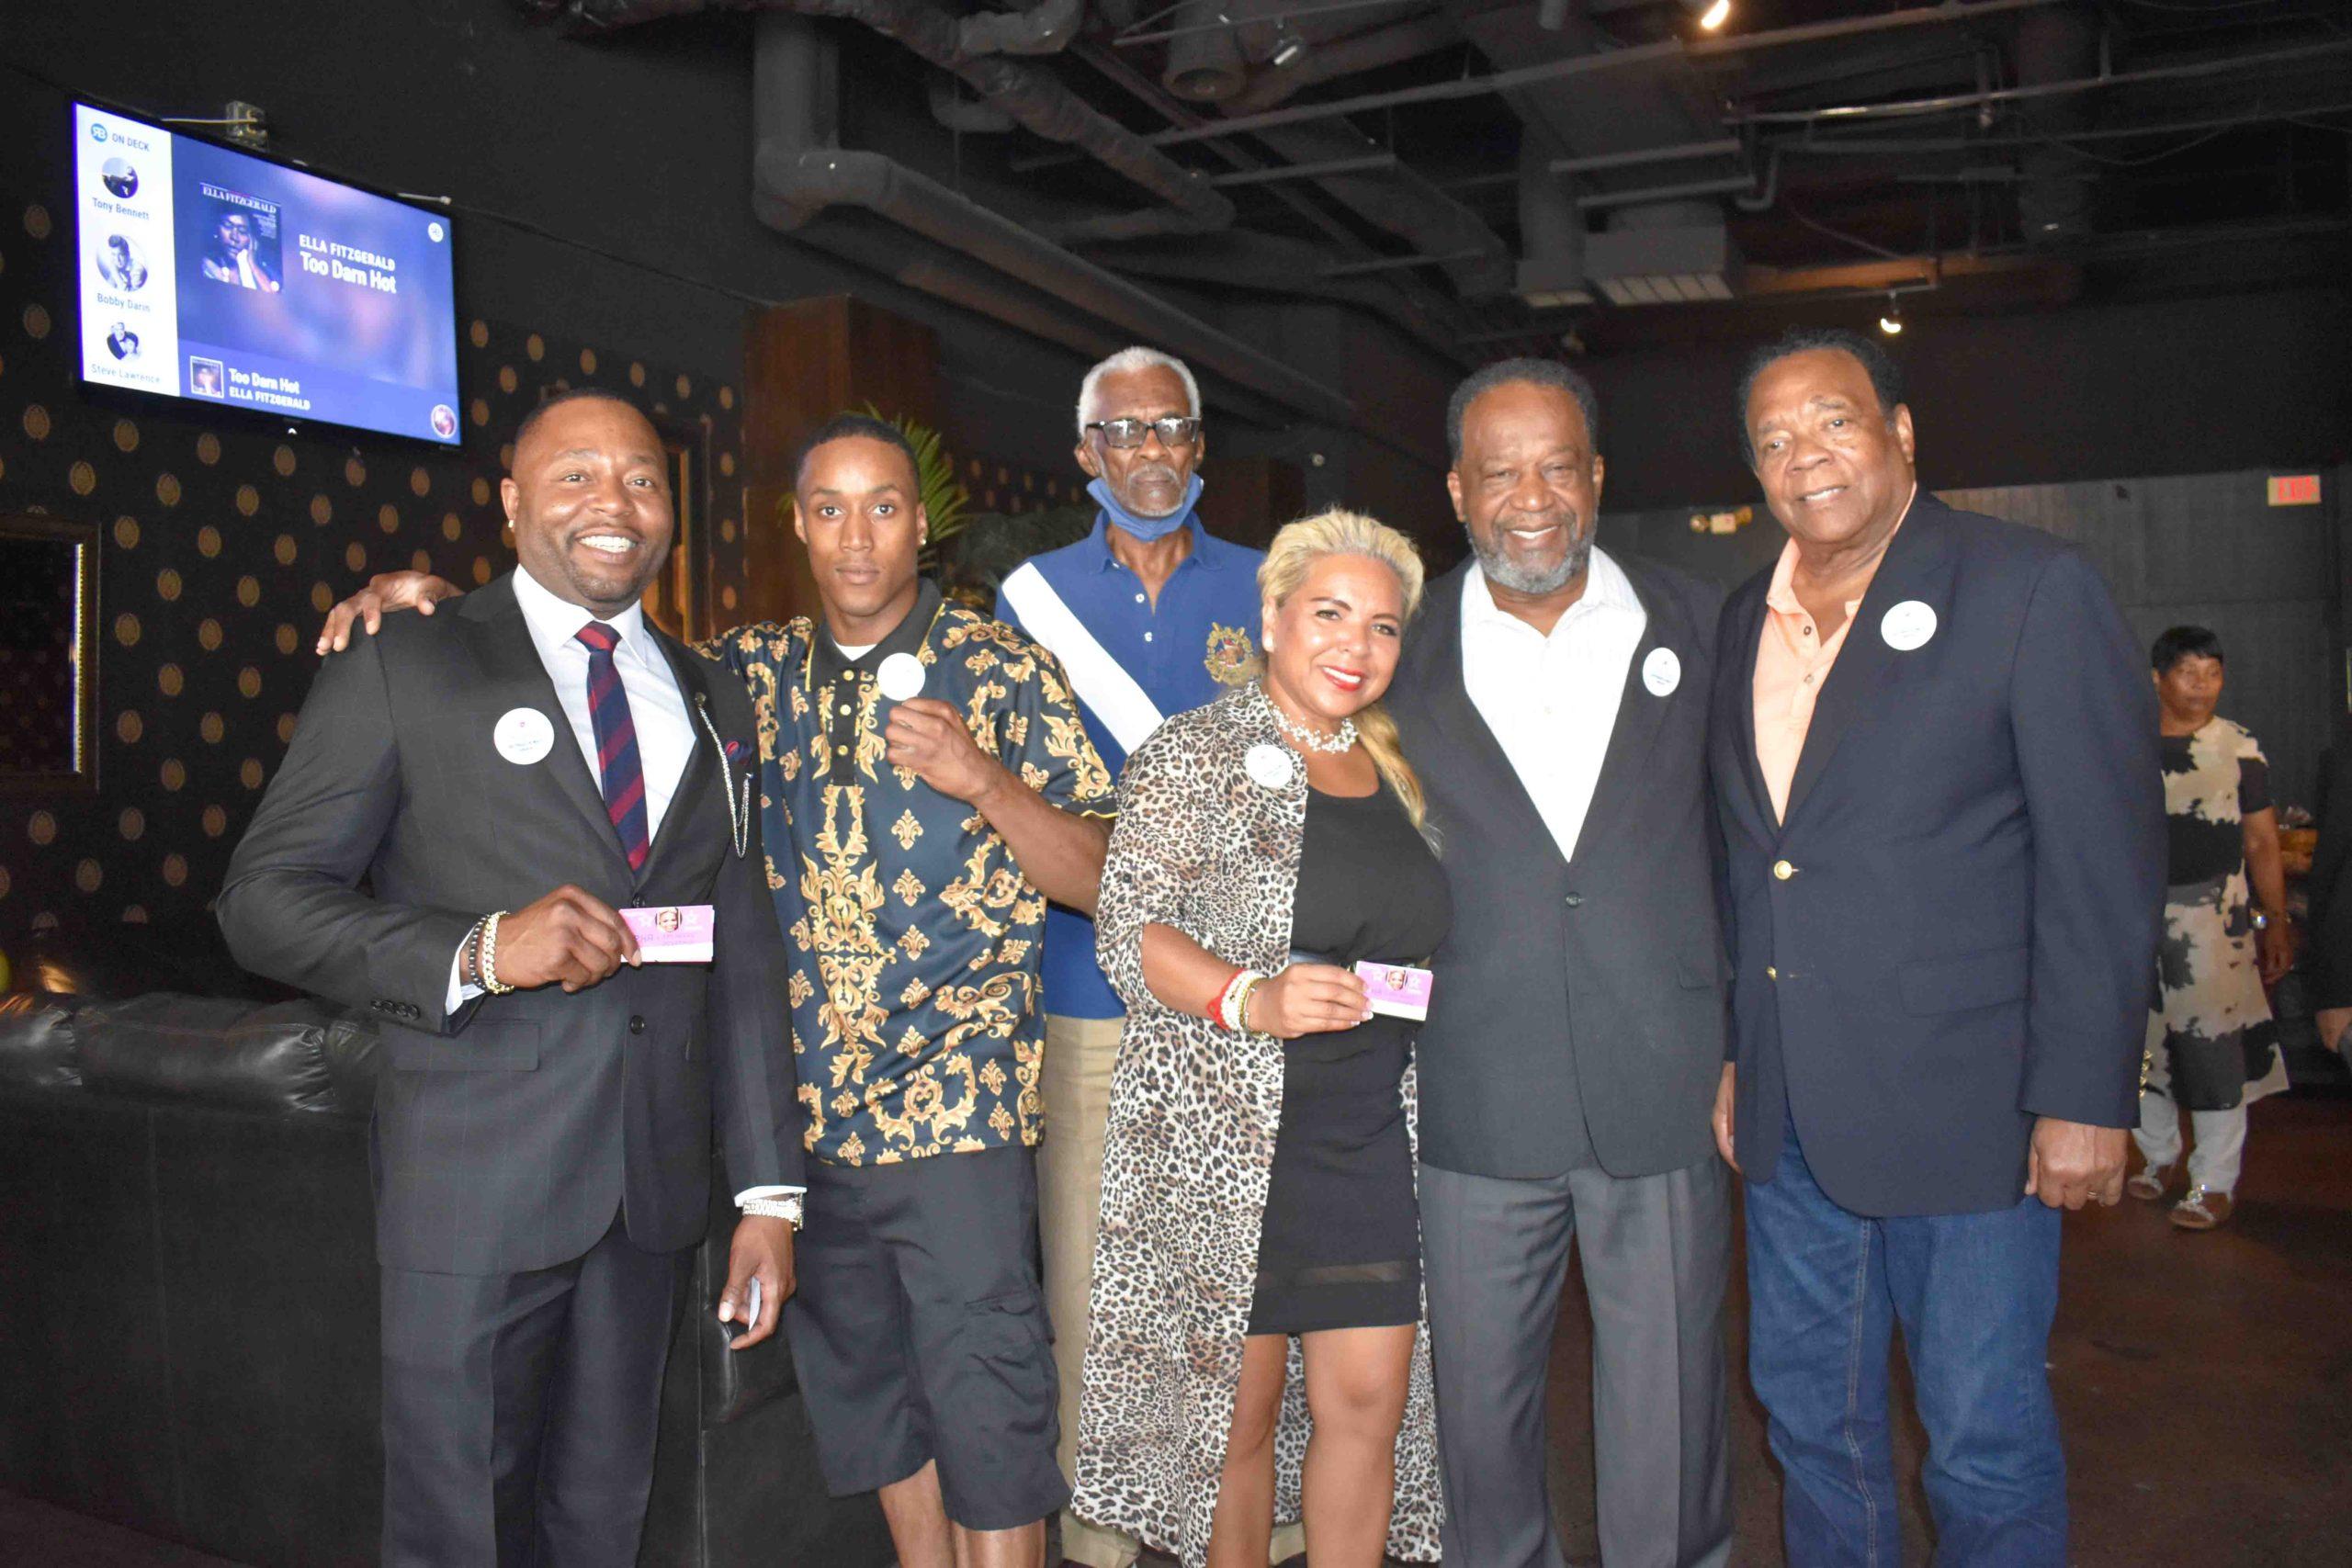 Supha Xayprasith-Mays (center), Richard Johnson, Derrick Person, Jr., Jack Foster, Bob Nash, Hon. Richard Mays, Sr.